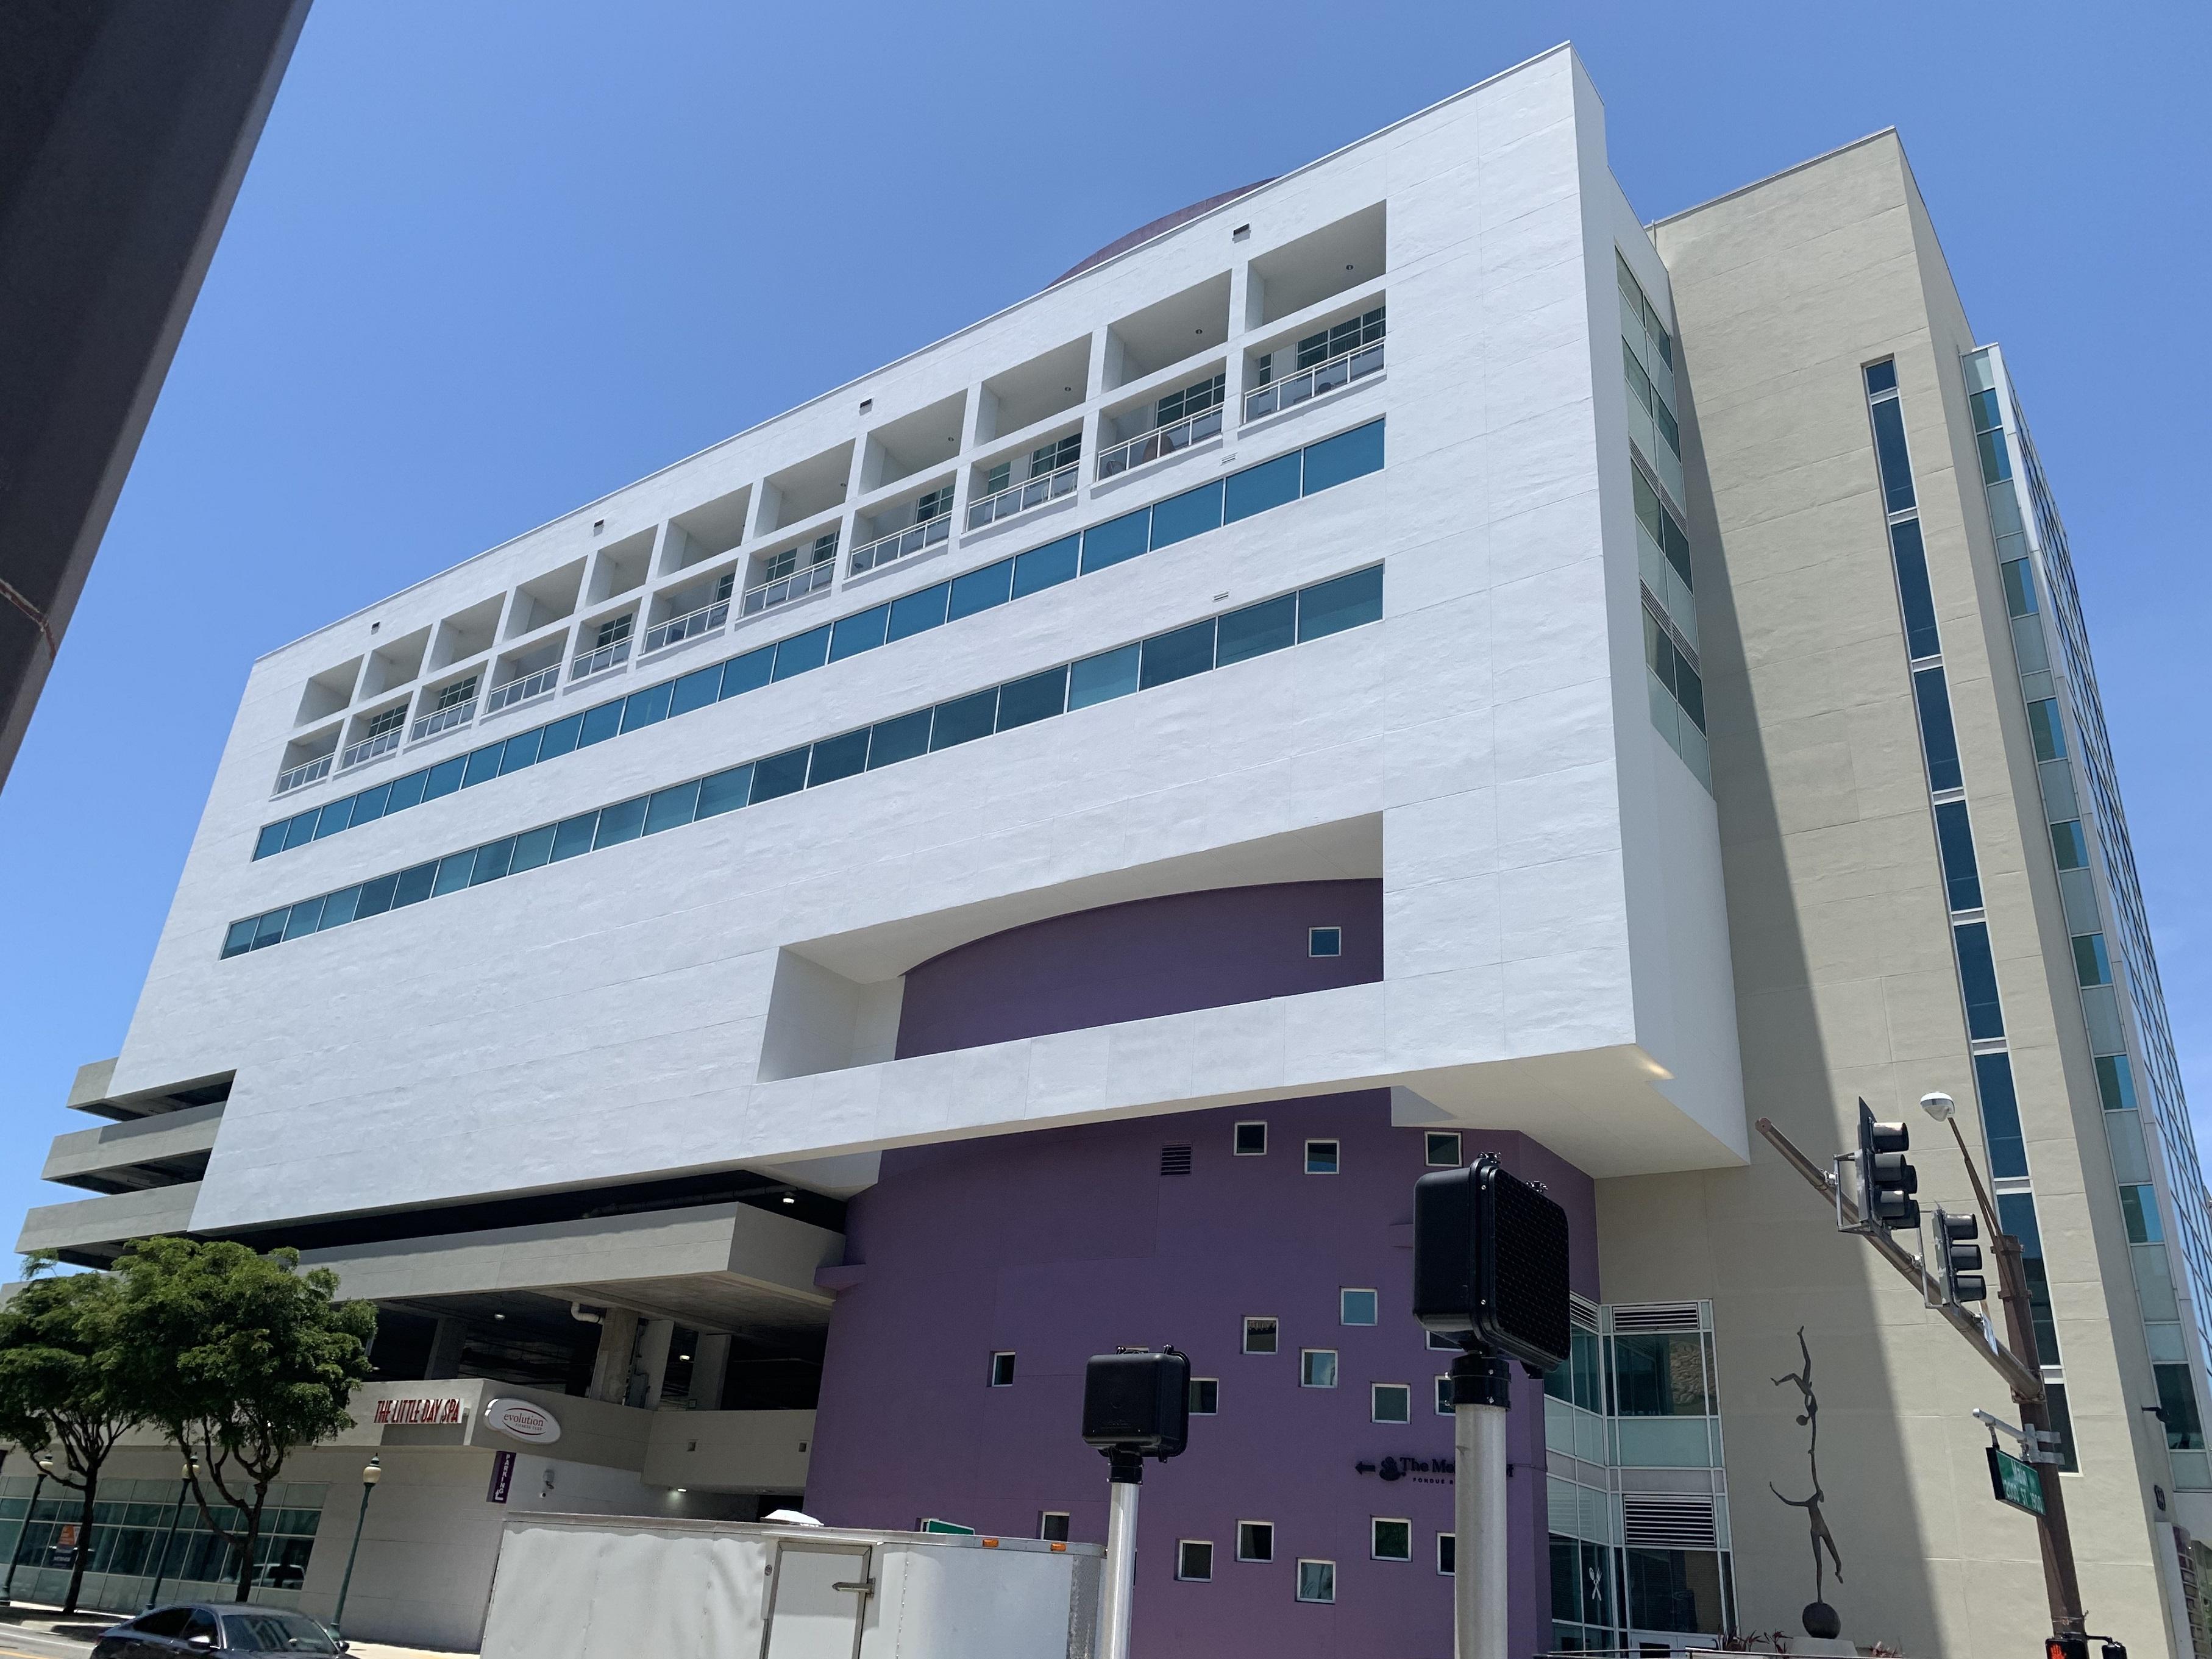 Cityscape Downtown Sarasota Condos